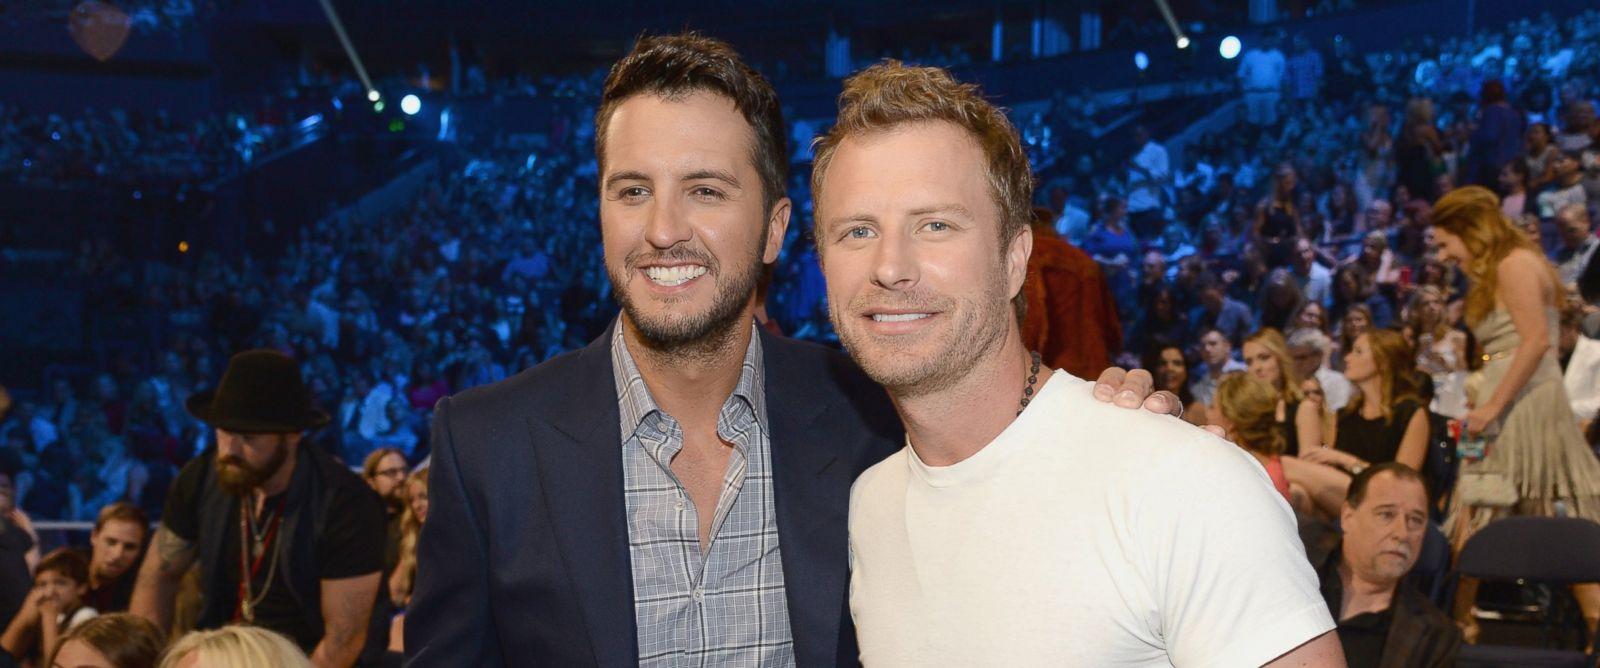 PHOTO: Luke Bryan, left, and Dierks Bentley attend the 2015 CMT Music awards at the Bridgestone Arena on June 10, 2015 in Nashville, Tenn.